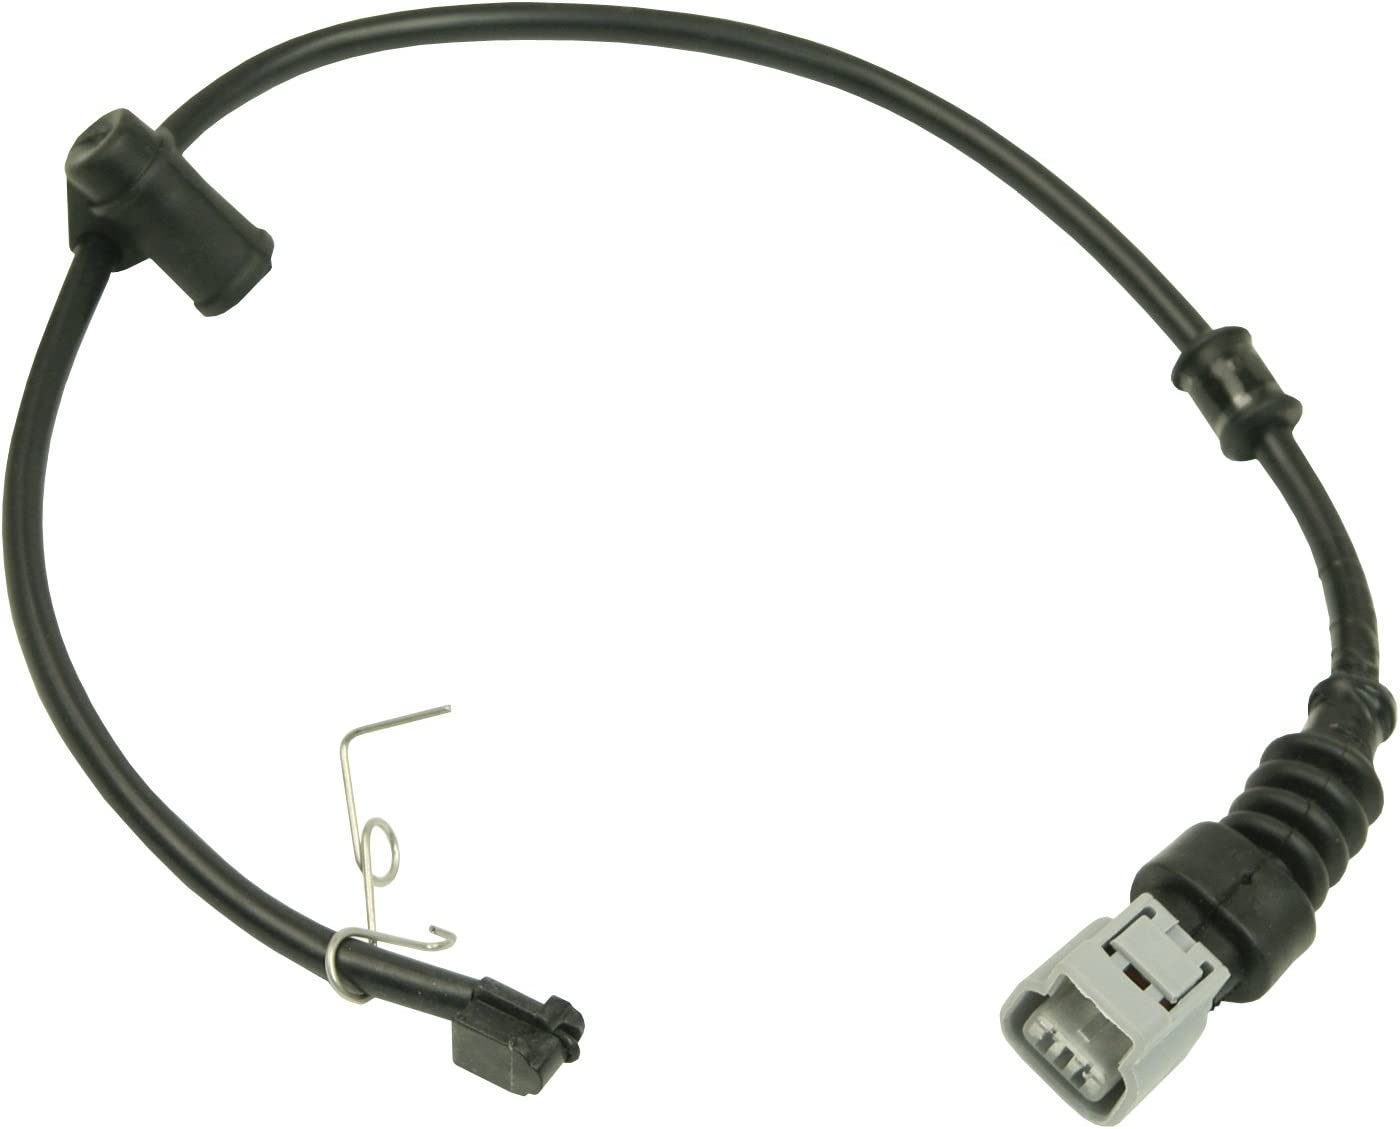 Beck Arnley 084-1747 Brake Pad Sensor Wire